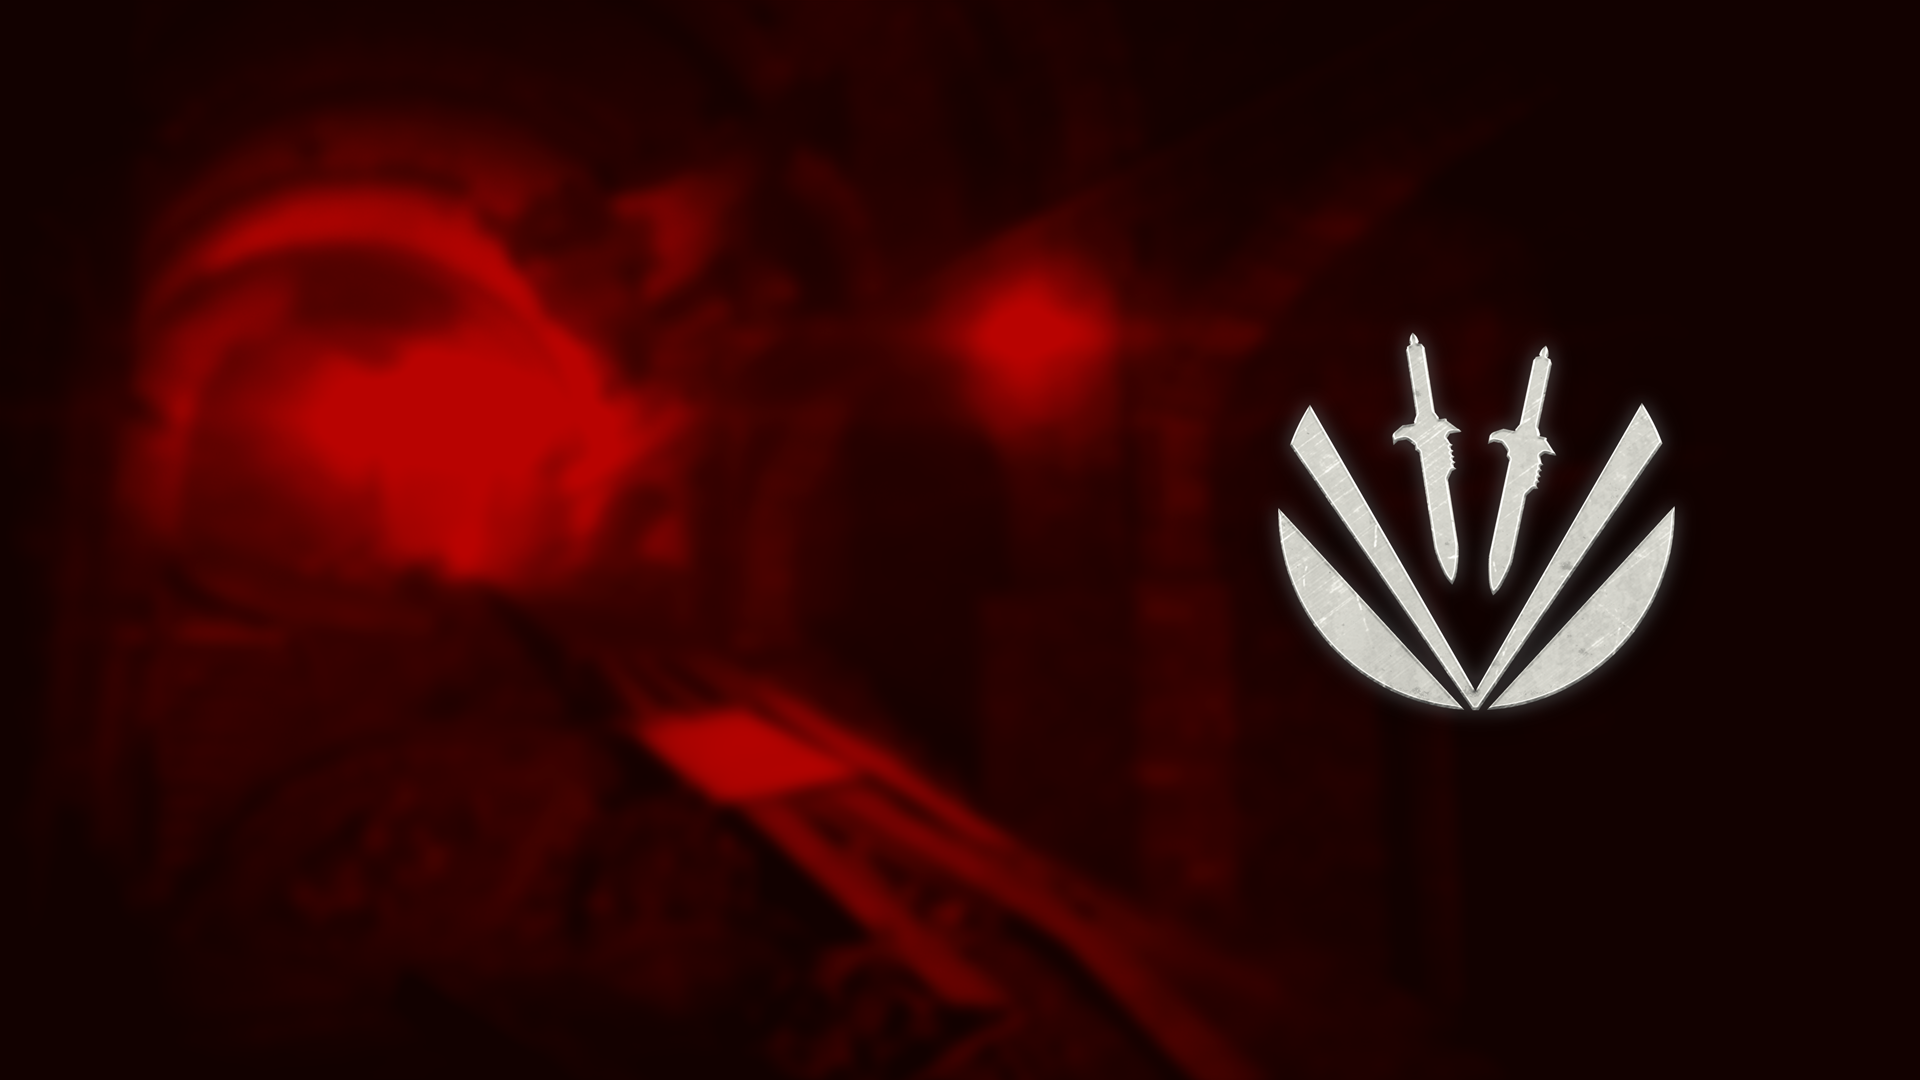 Icon for Knife sheath ++